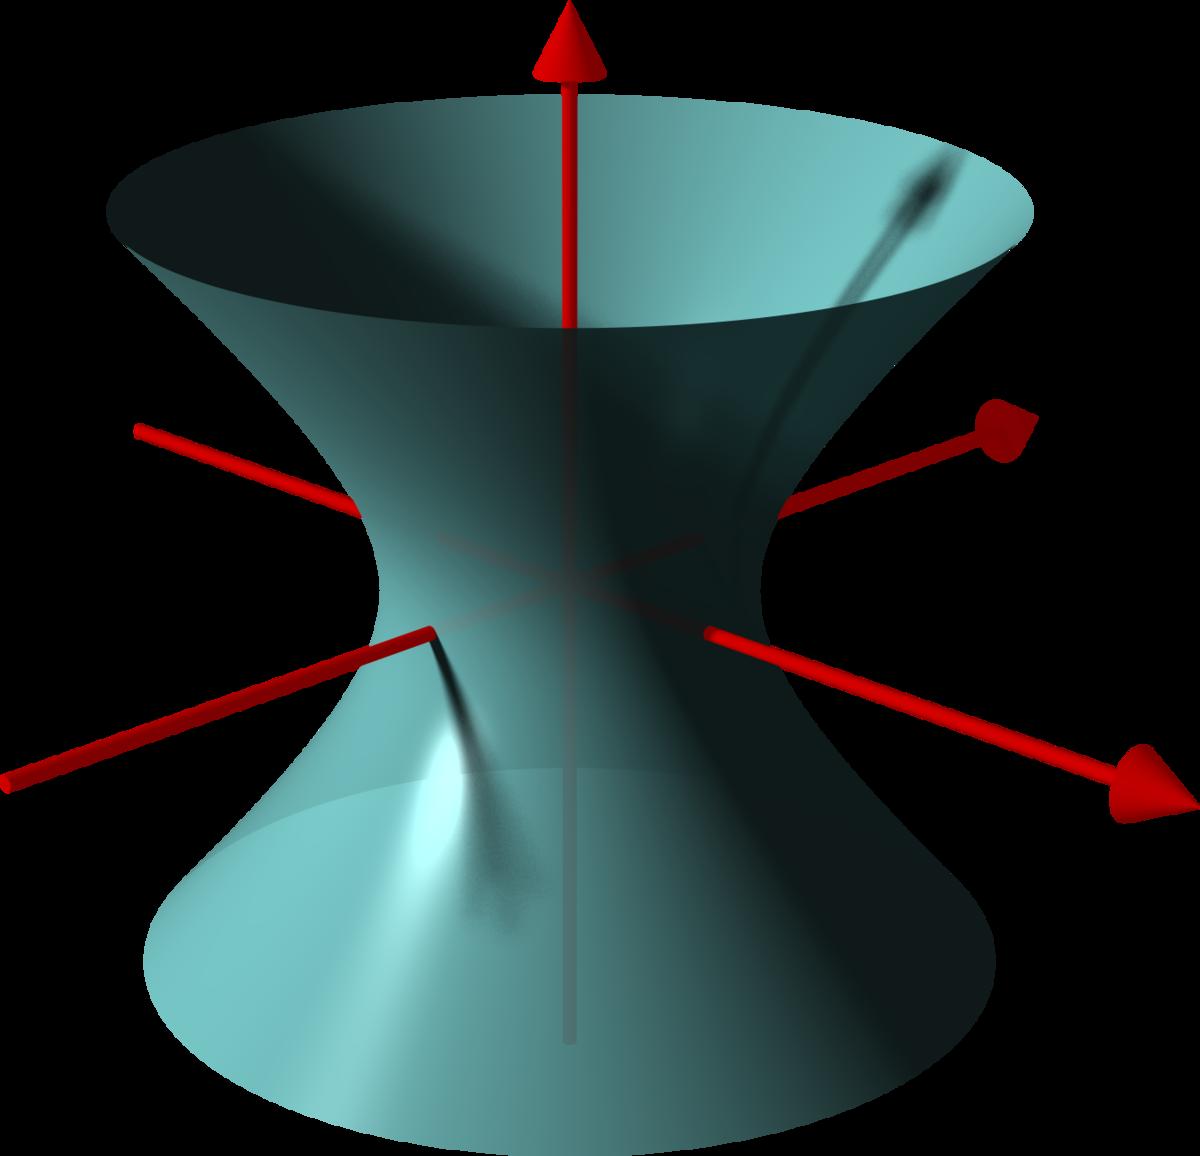 Hyperboloid - Wikipedia